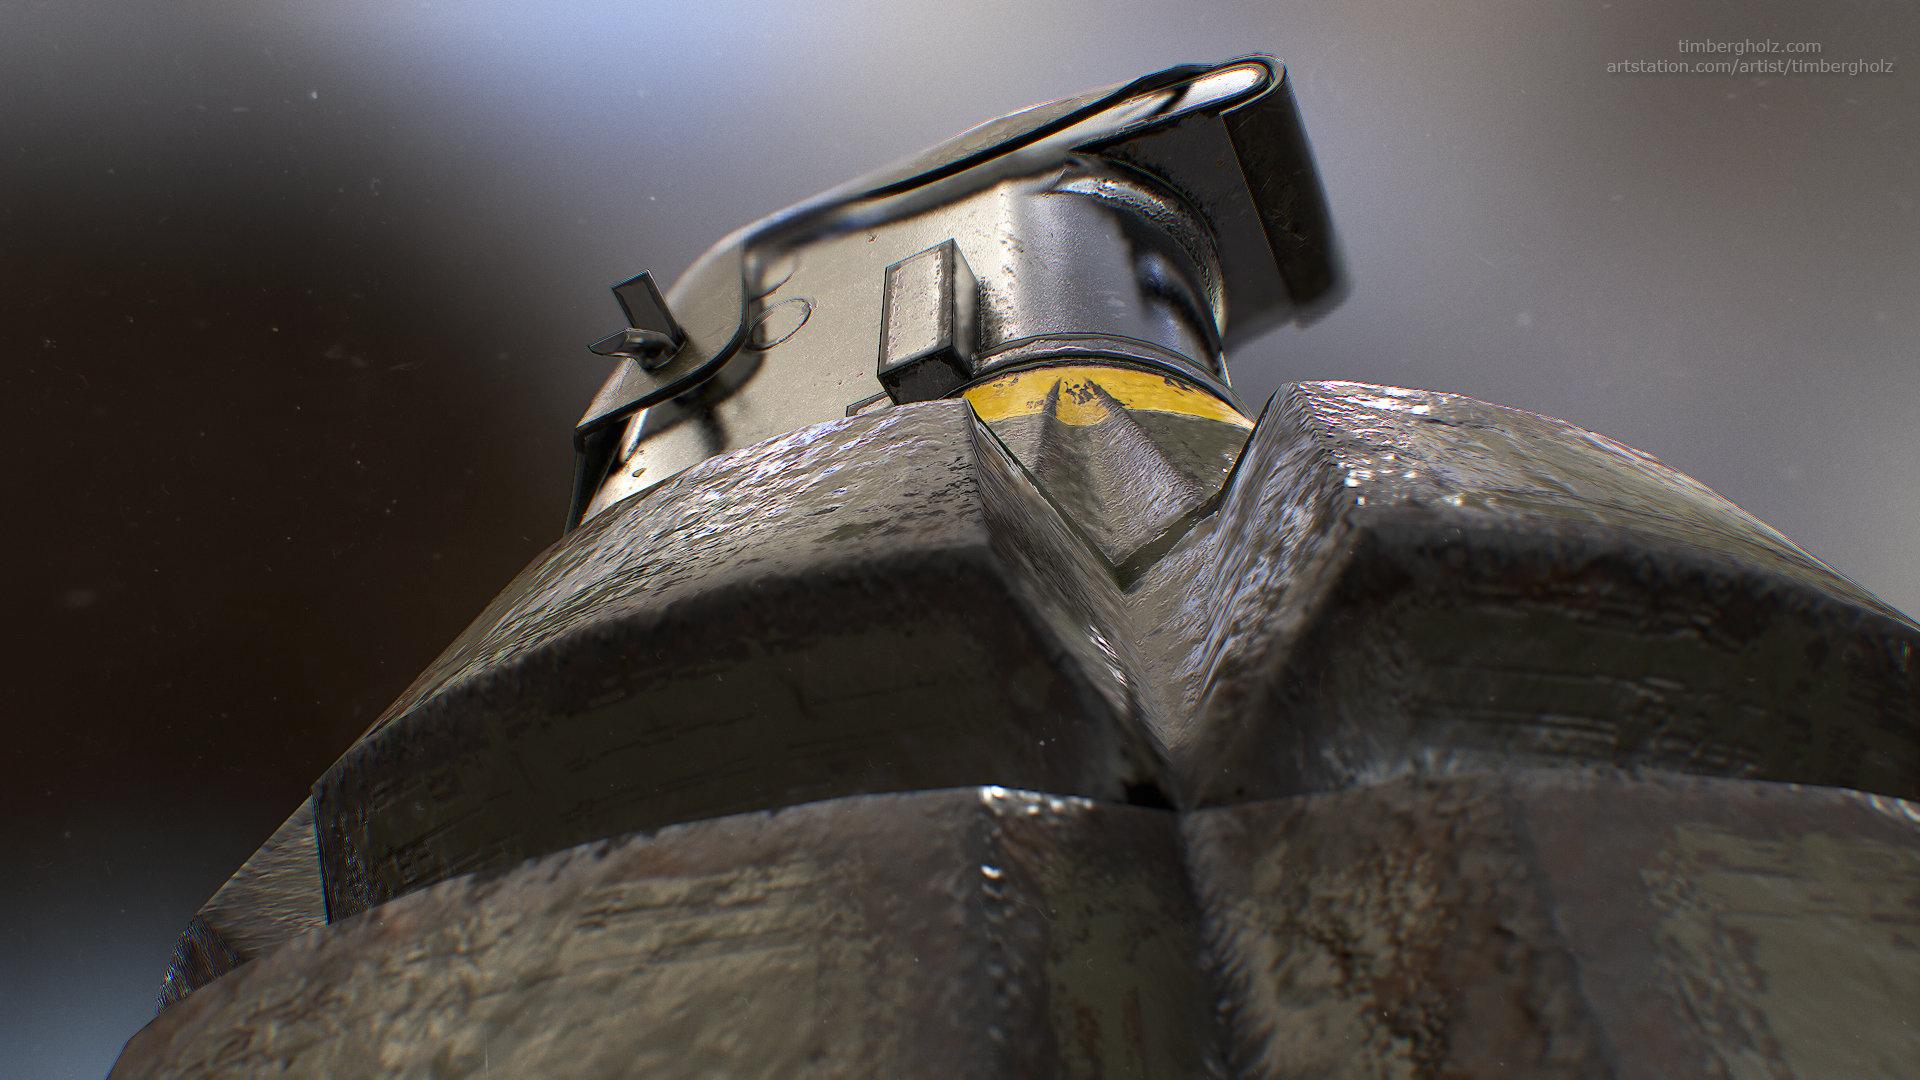 Tim bergholz mk2 grenade render 7